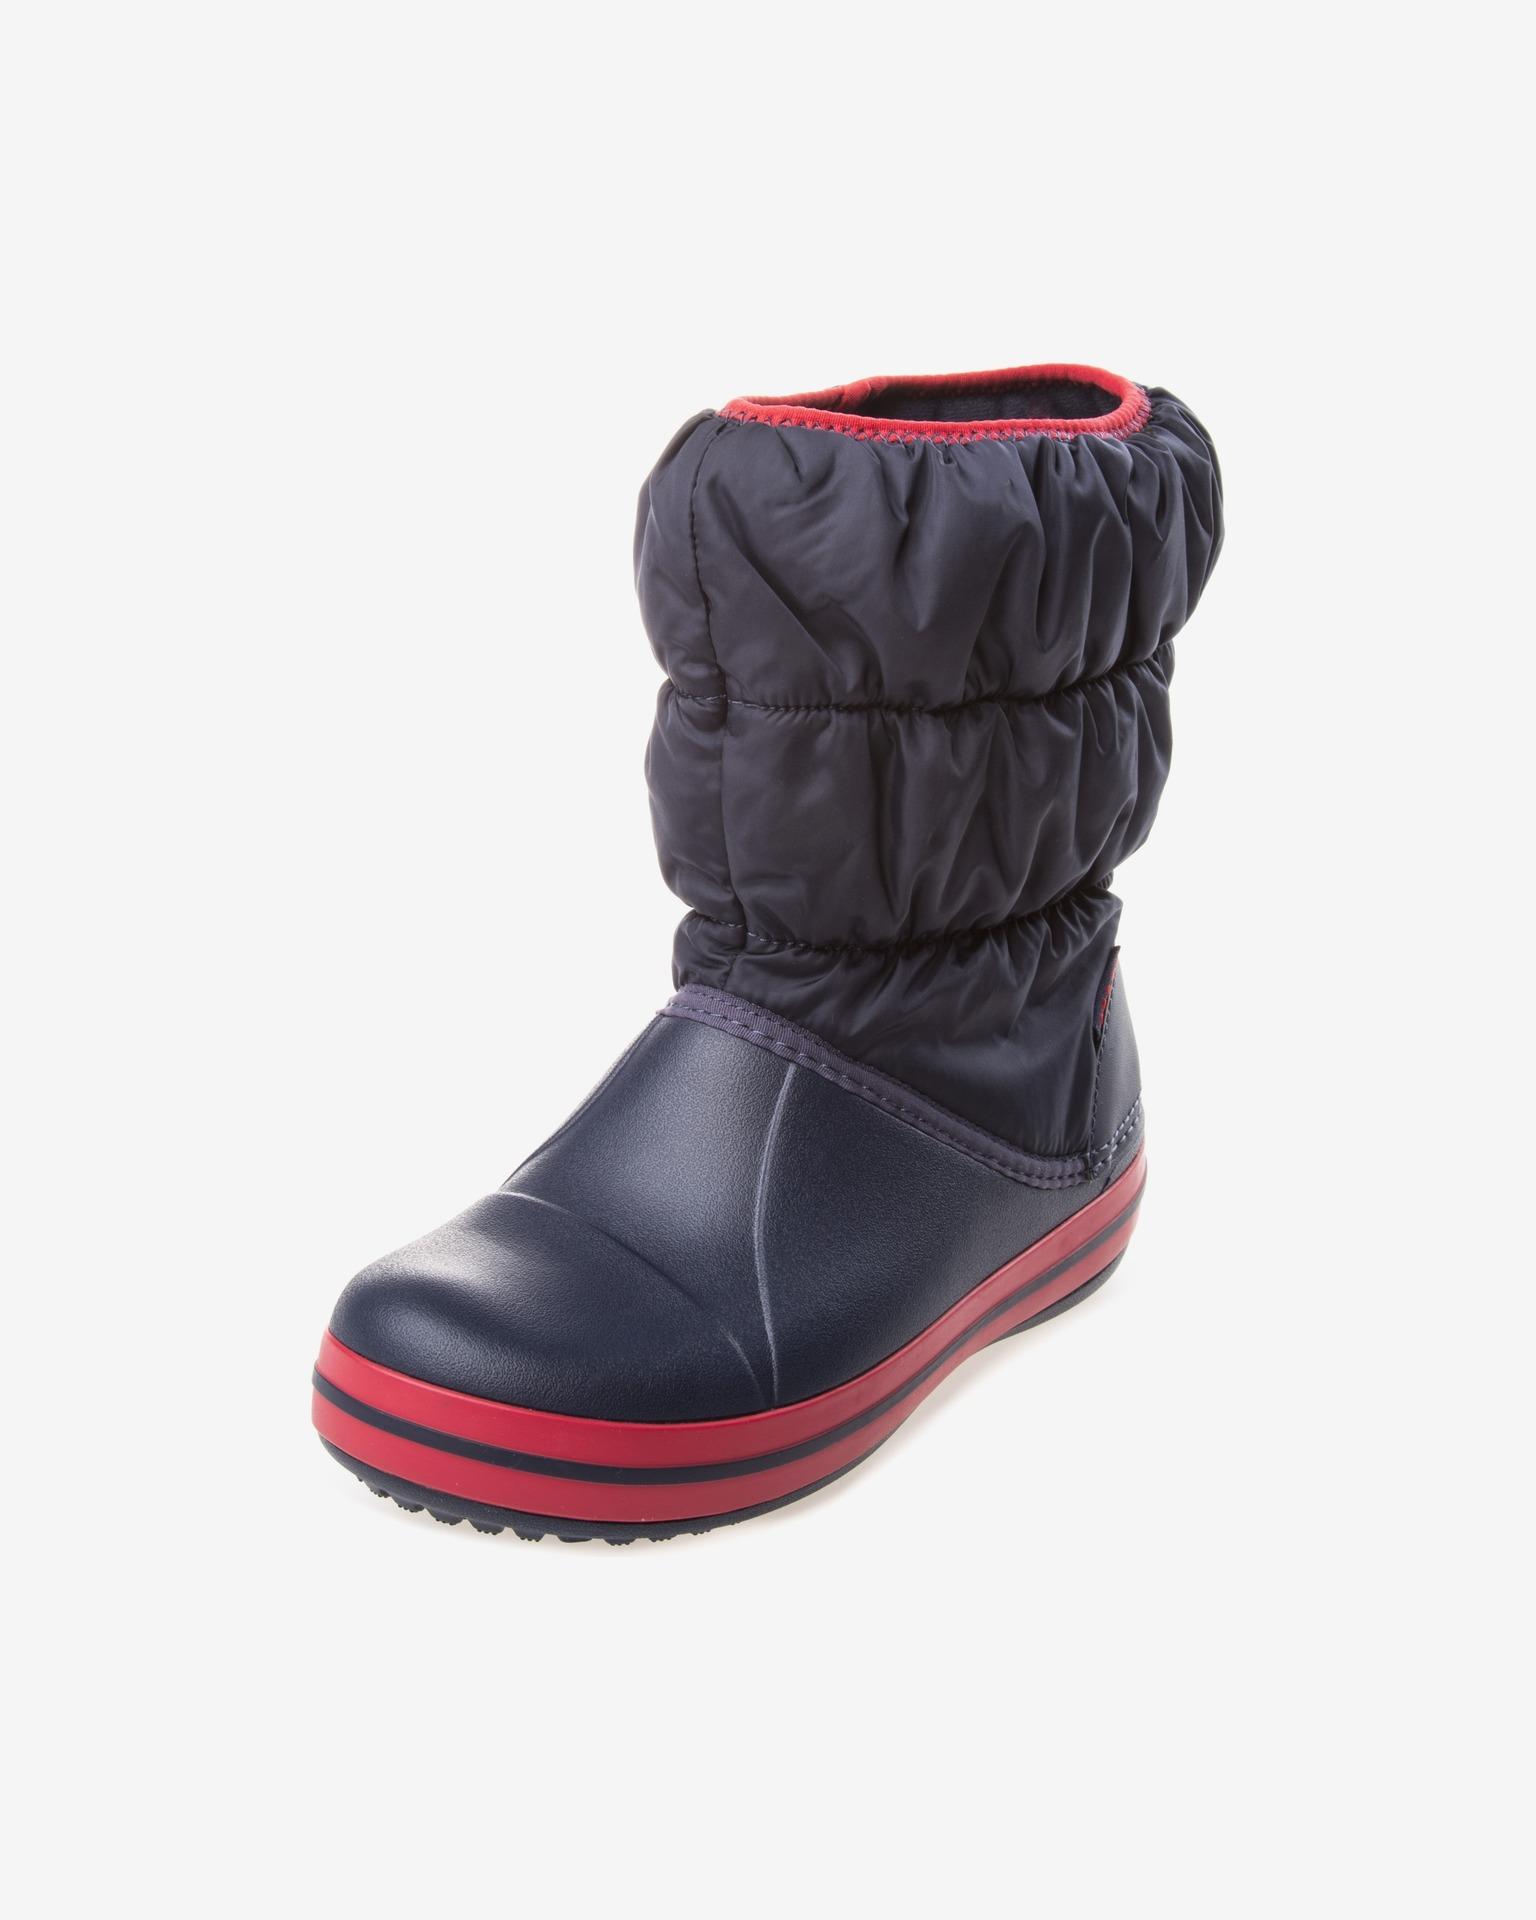 dfe8d969bc Crocs - Winter Puff Sněhule dětské